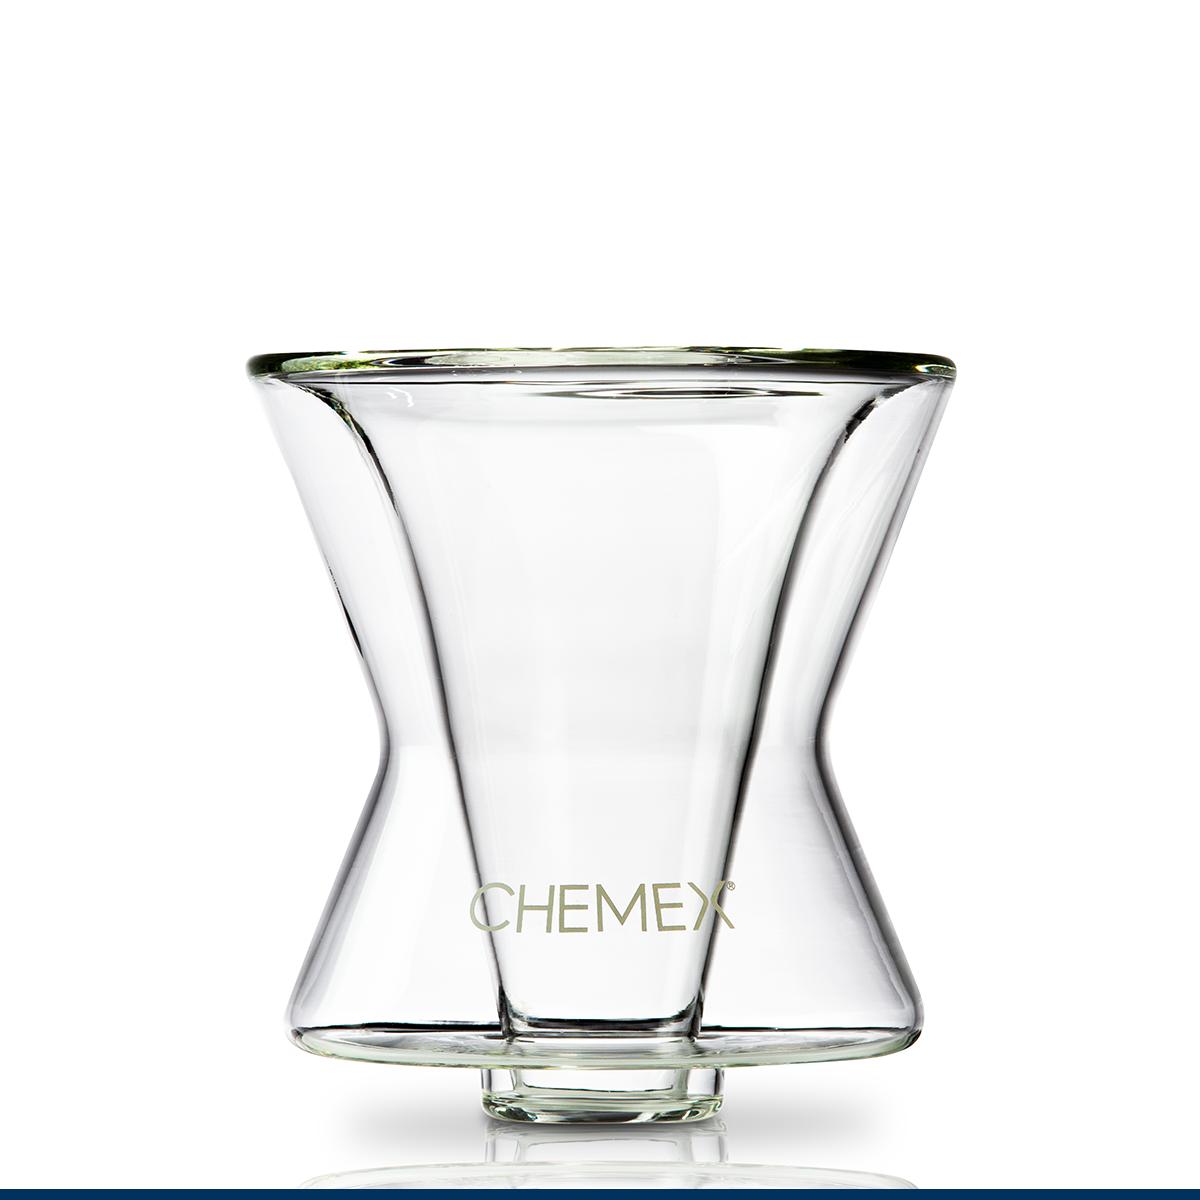 Carolina Coffee Funnex® - One Cup Glass Coffeemaker